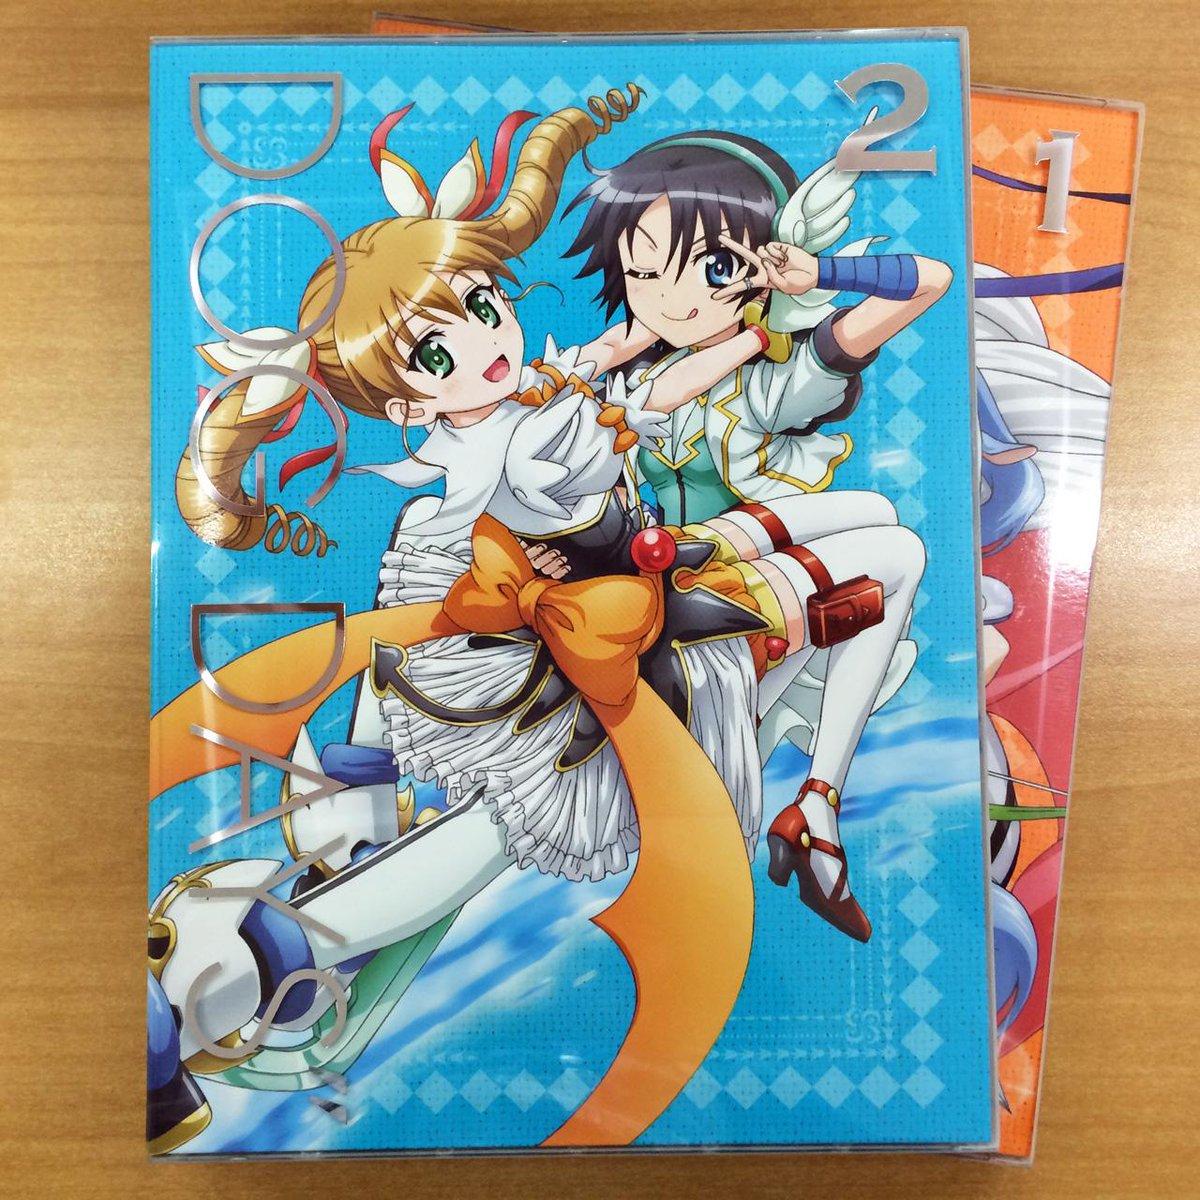 【BD&DVD②4/22発売】来週発売です! 完全生産限定版はキャラクターデザイン・坂田理さん描き下ろしデジジャ